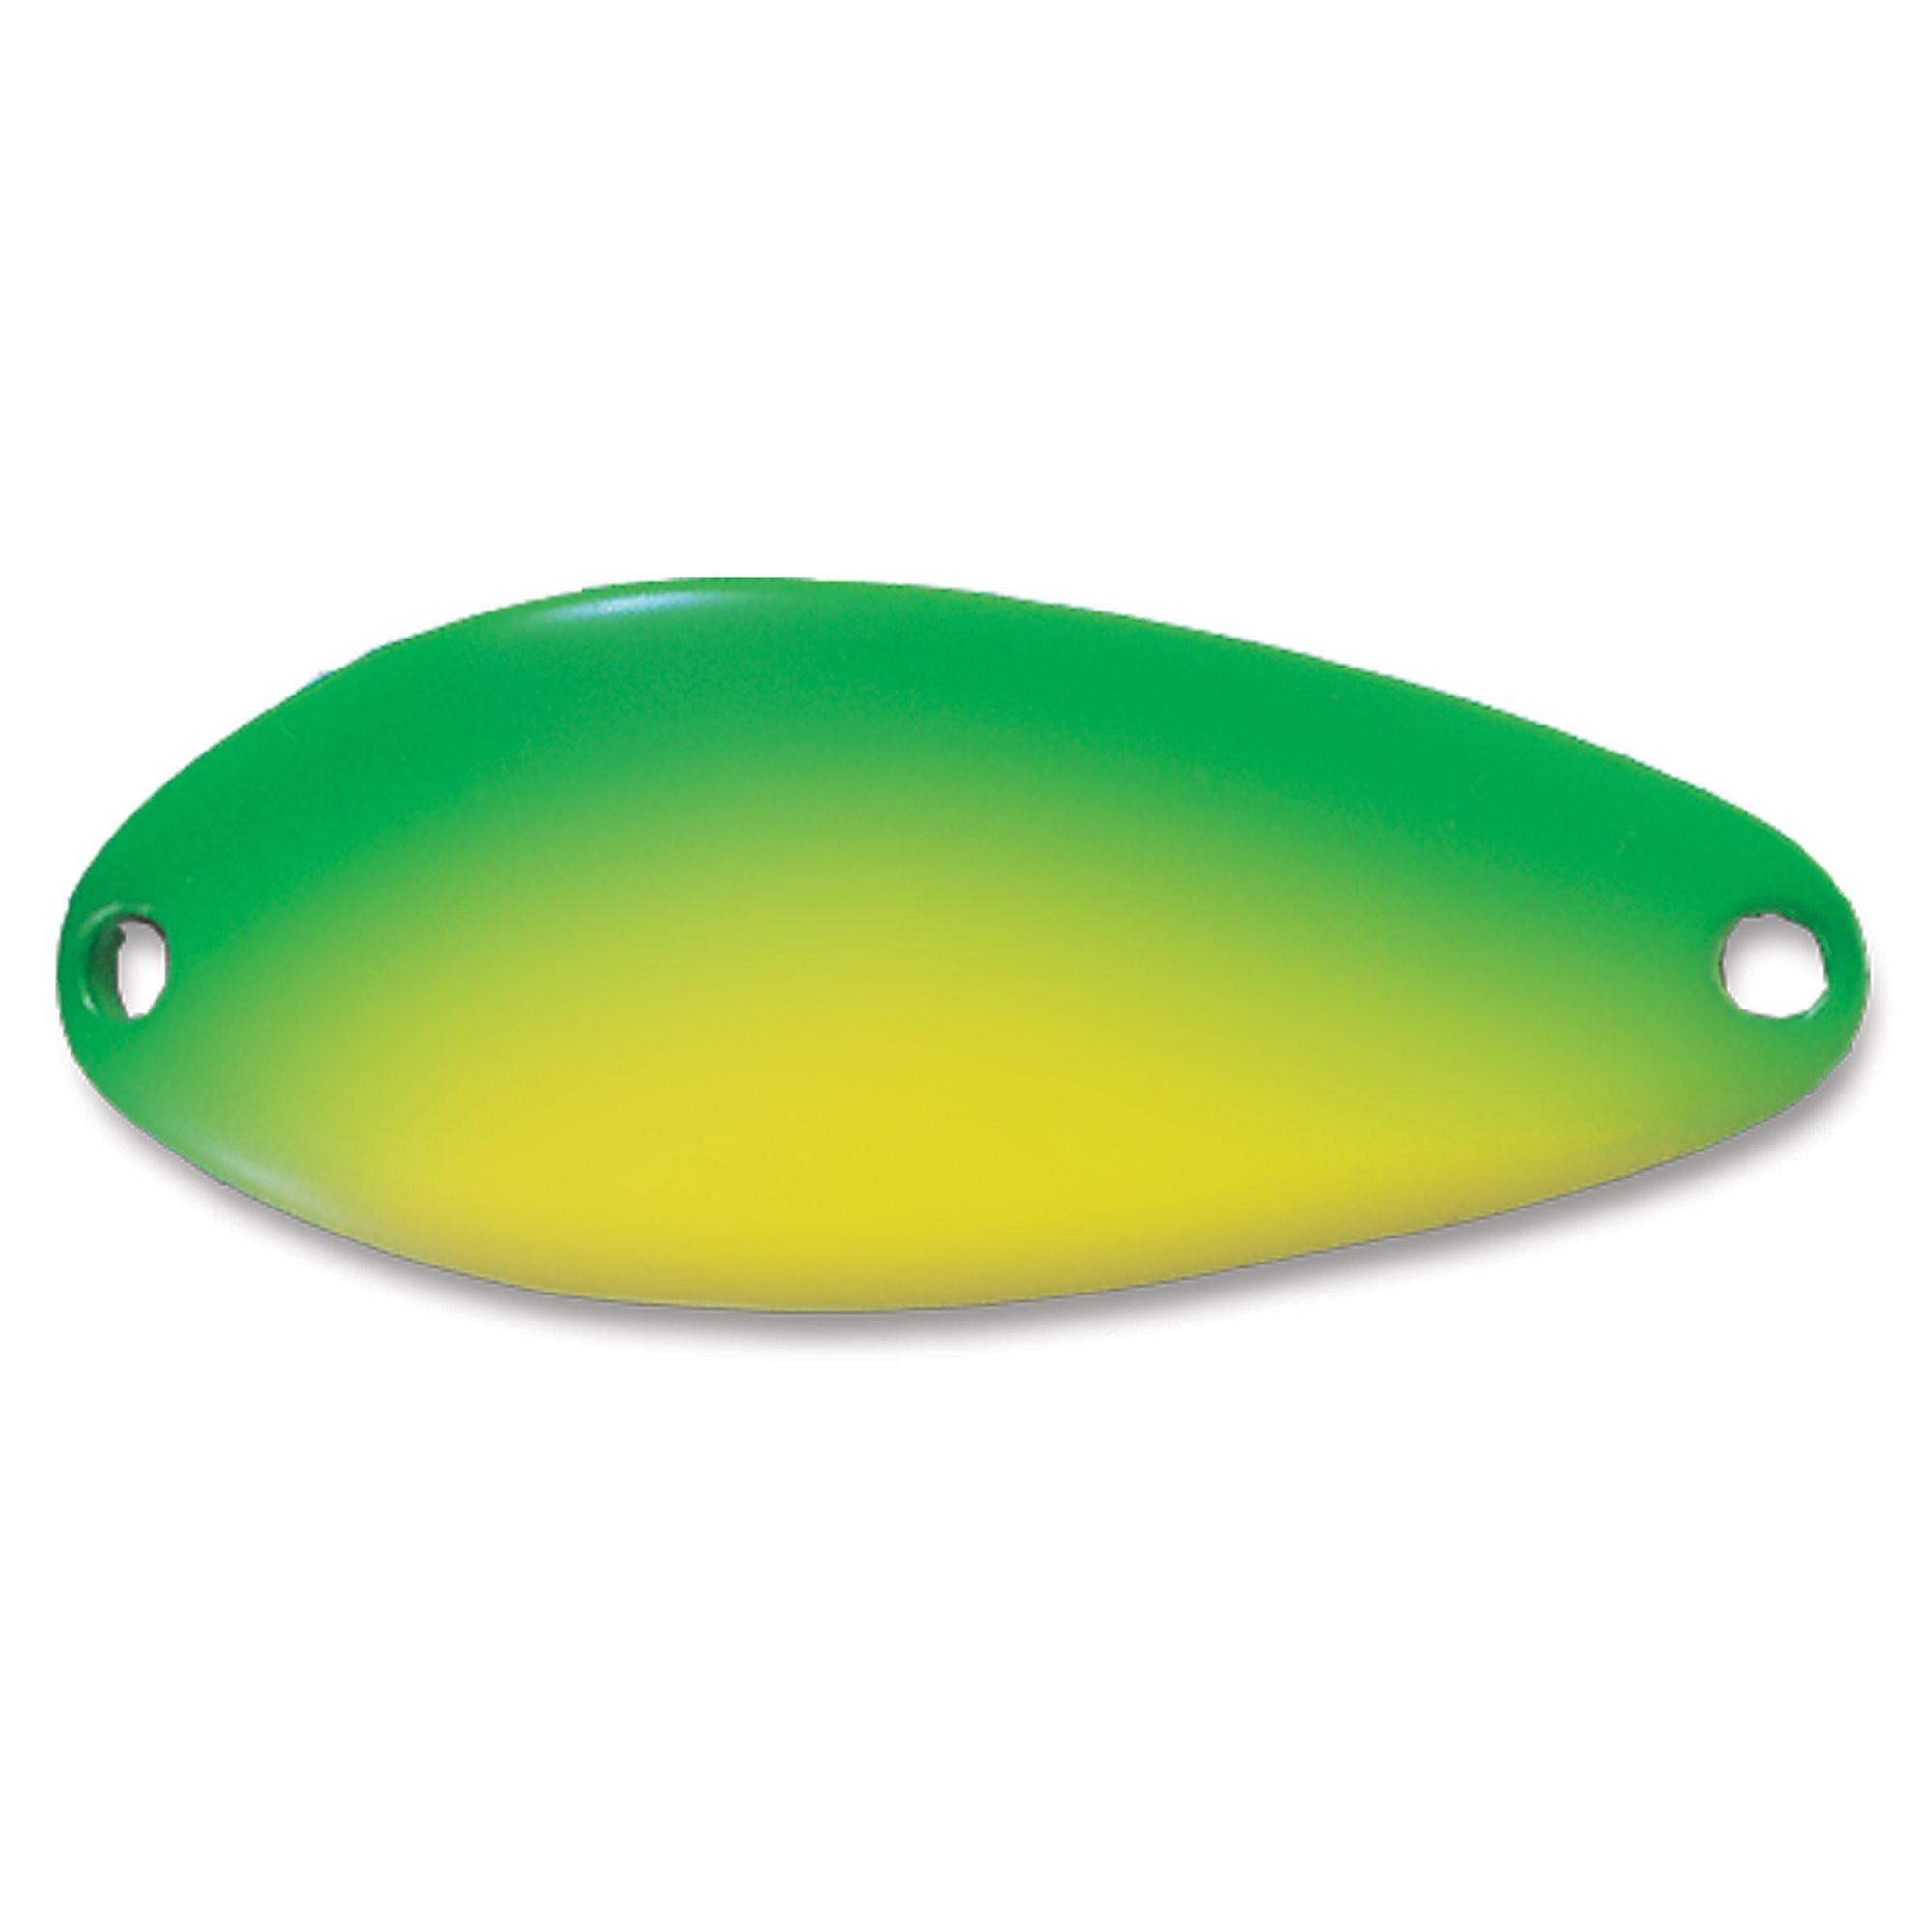 Acme Little Cleo C-100 1/3 Oz Green/Yellow